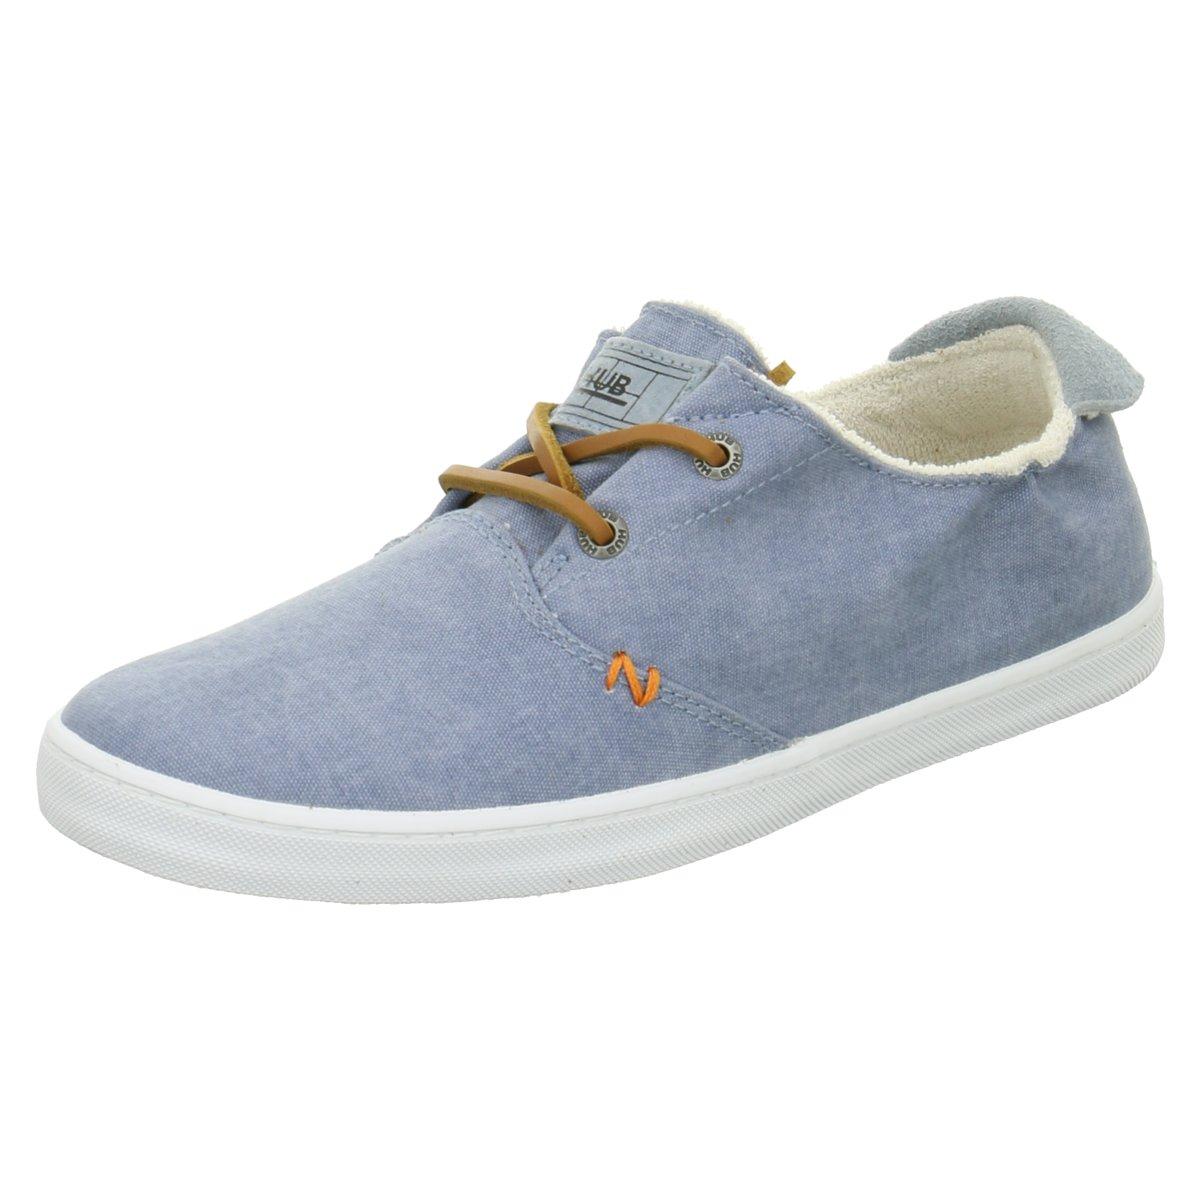 info for 12a0a 7515b Details zu Hub Damen Sneaker KYOTO ARONABLUE blau 105360